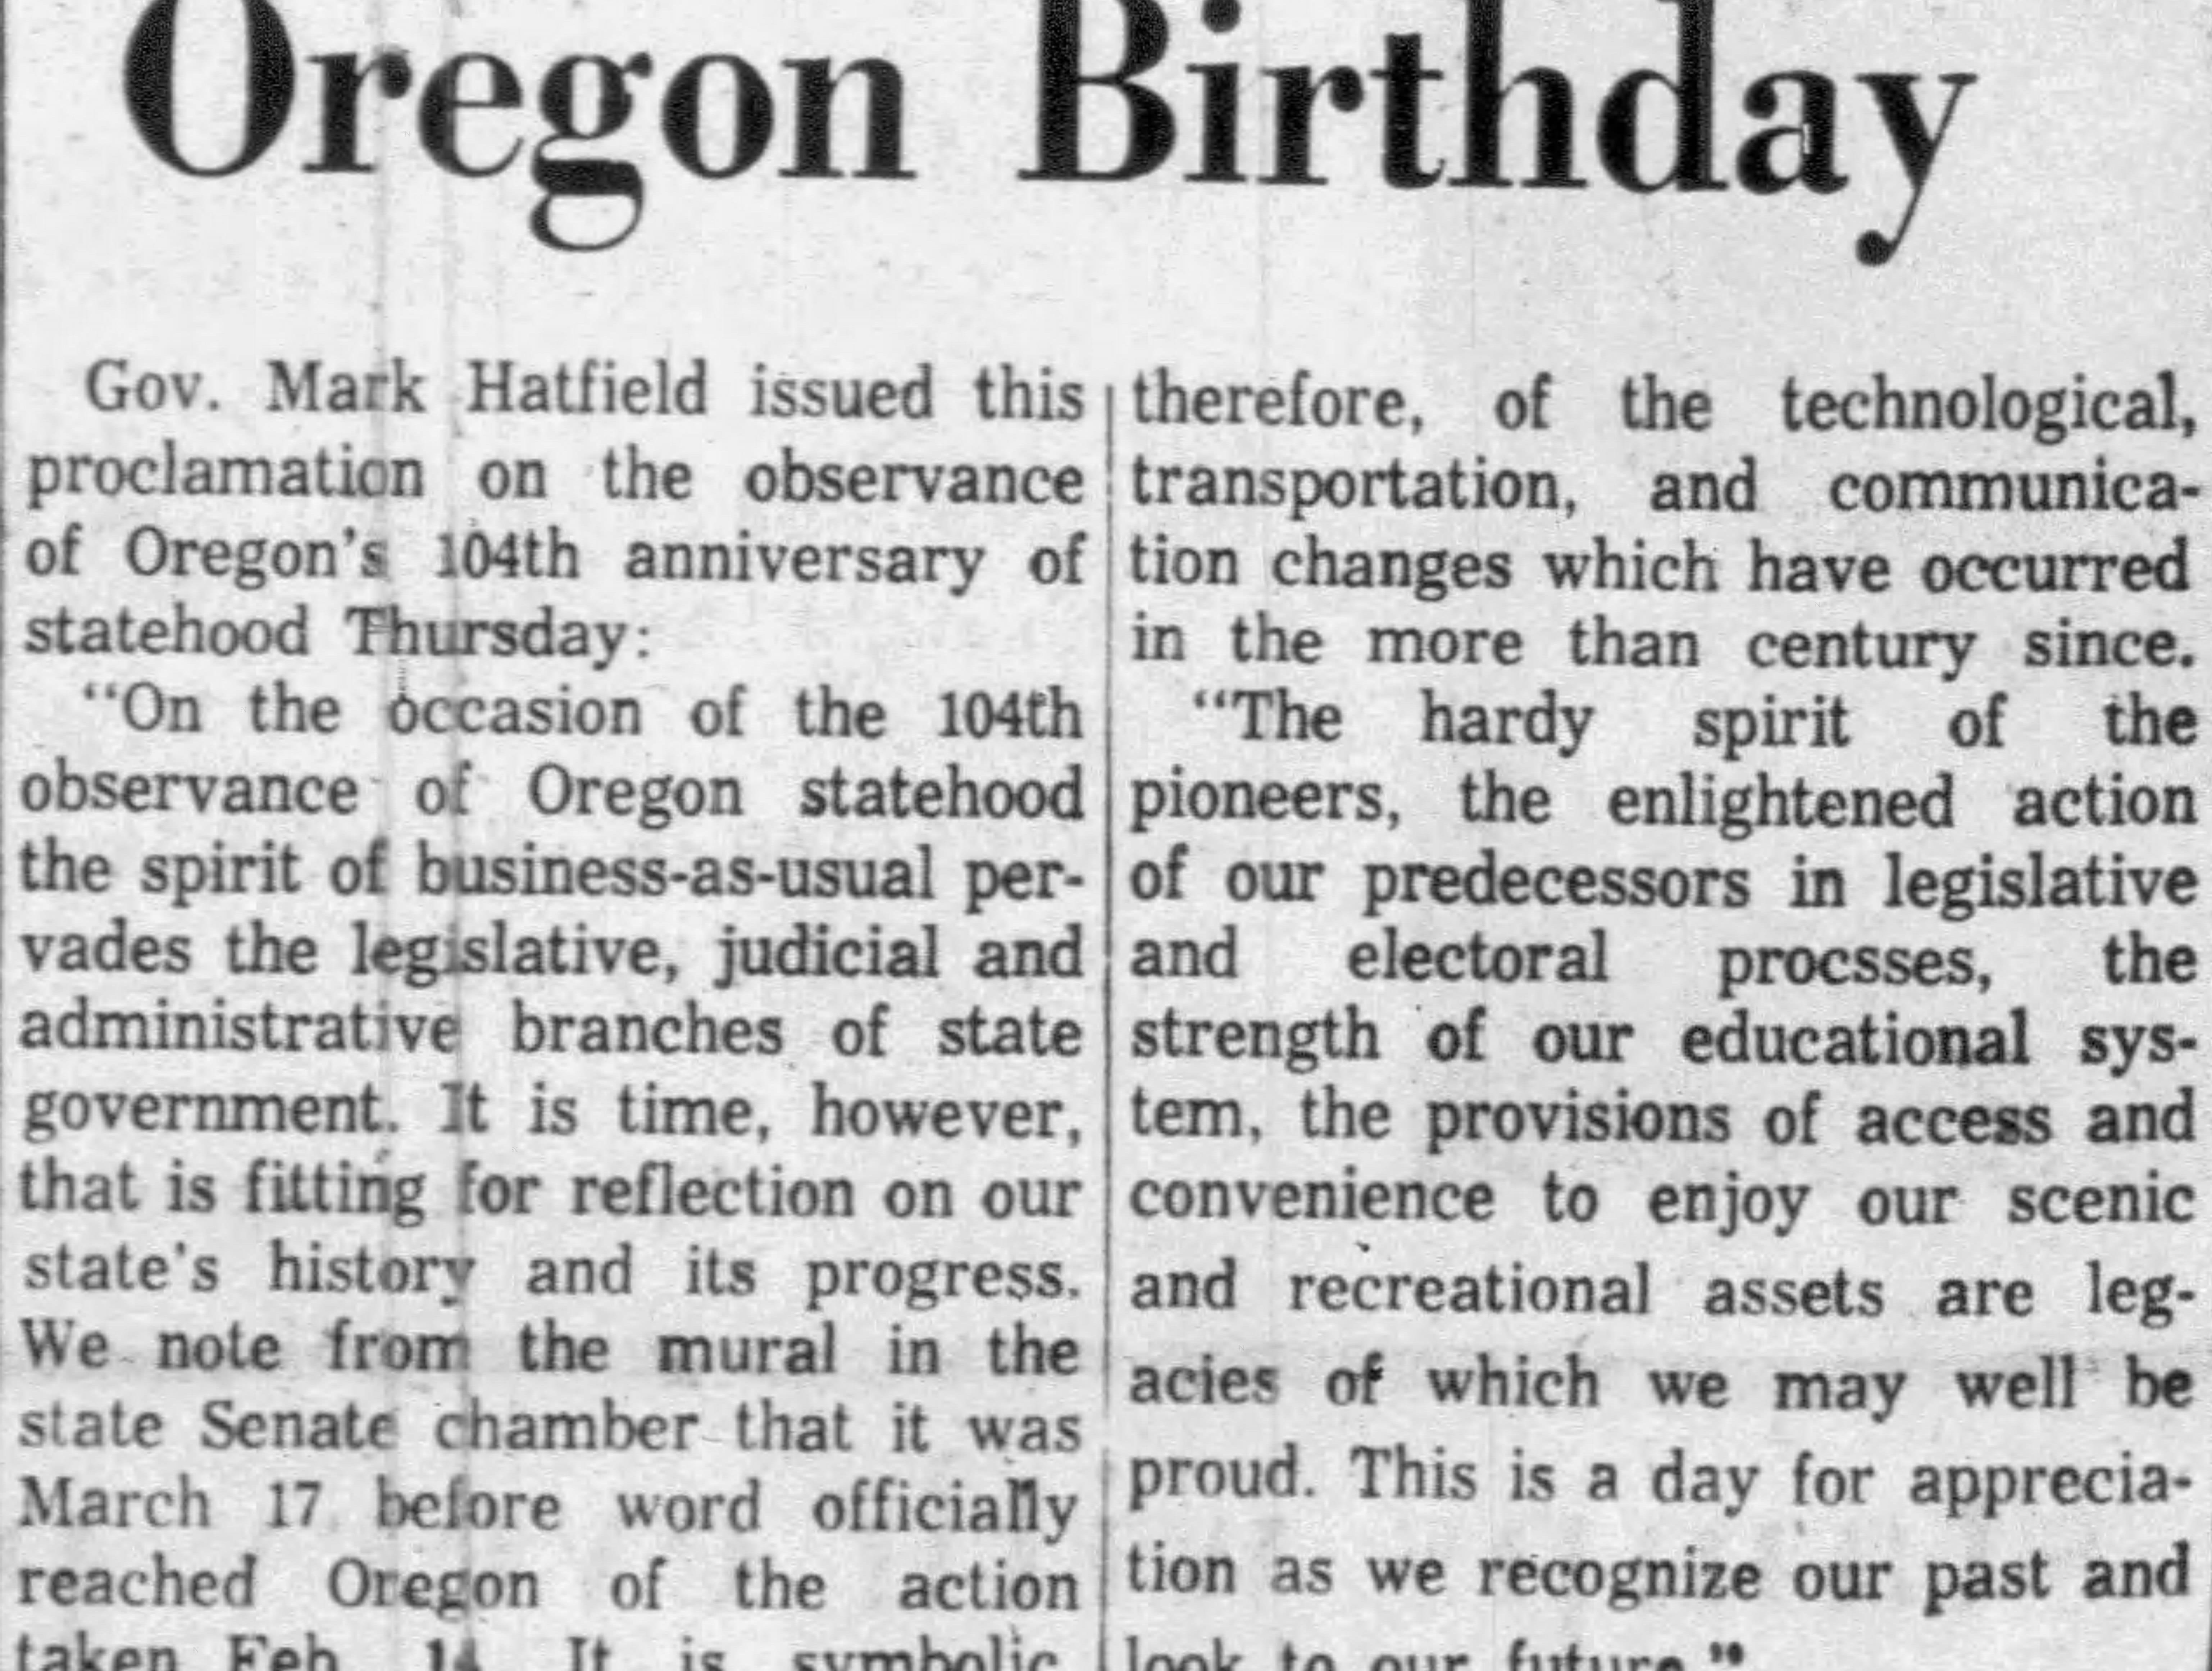 Gov. Mark Hatfield's proclamation in observation of Oregon's 104th birthday on Feb. 14, 1963.